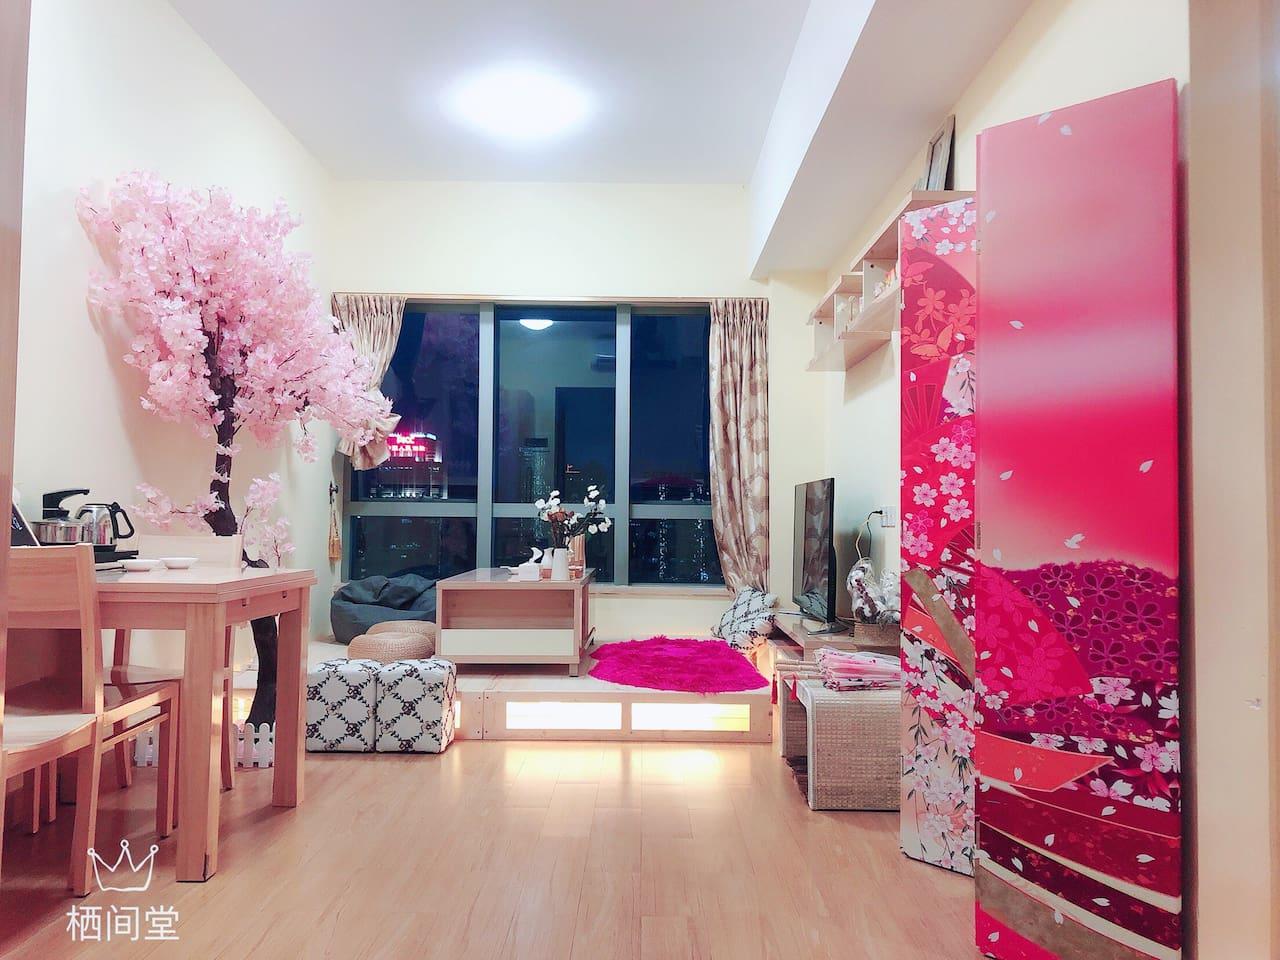 「YKG栖间堂」华贸懒宅/落地城景/阳光两居/华贸中心